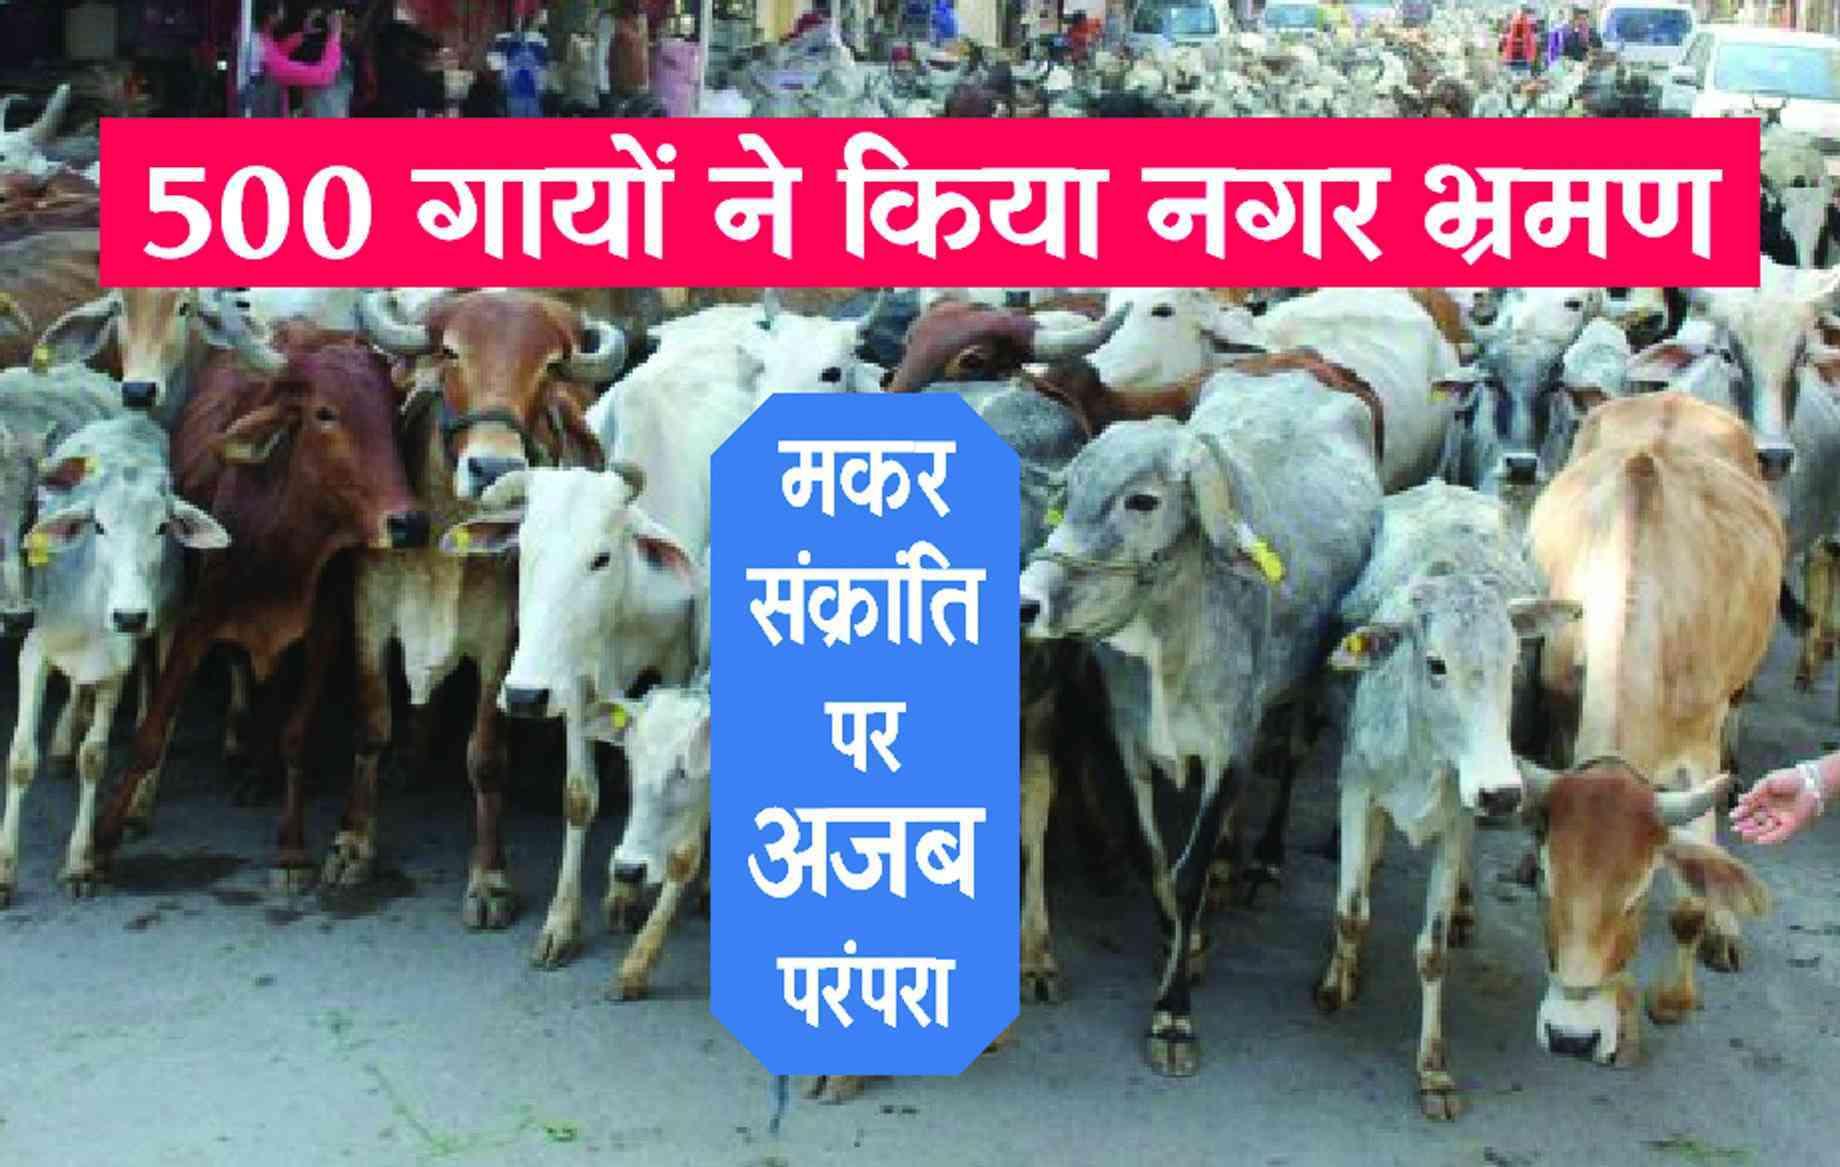 Rajsamand news,Rajsamand Hindi news,Rajsamand local news,rajsamand latest hindi news,rajsamand latest news rajsamand,Latest News rajsamand,Latest hindi news rajsamand,